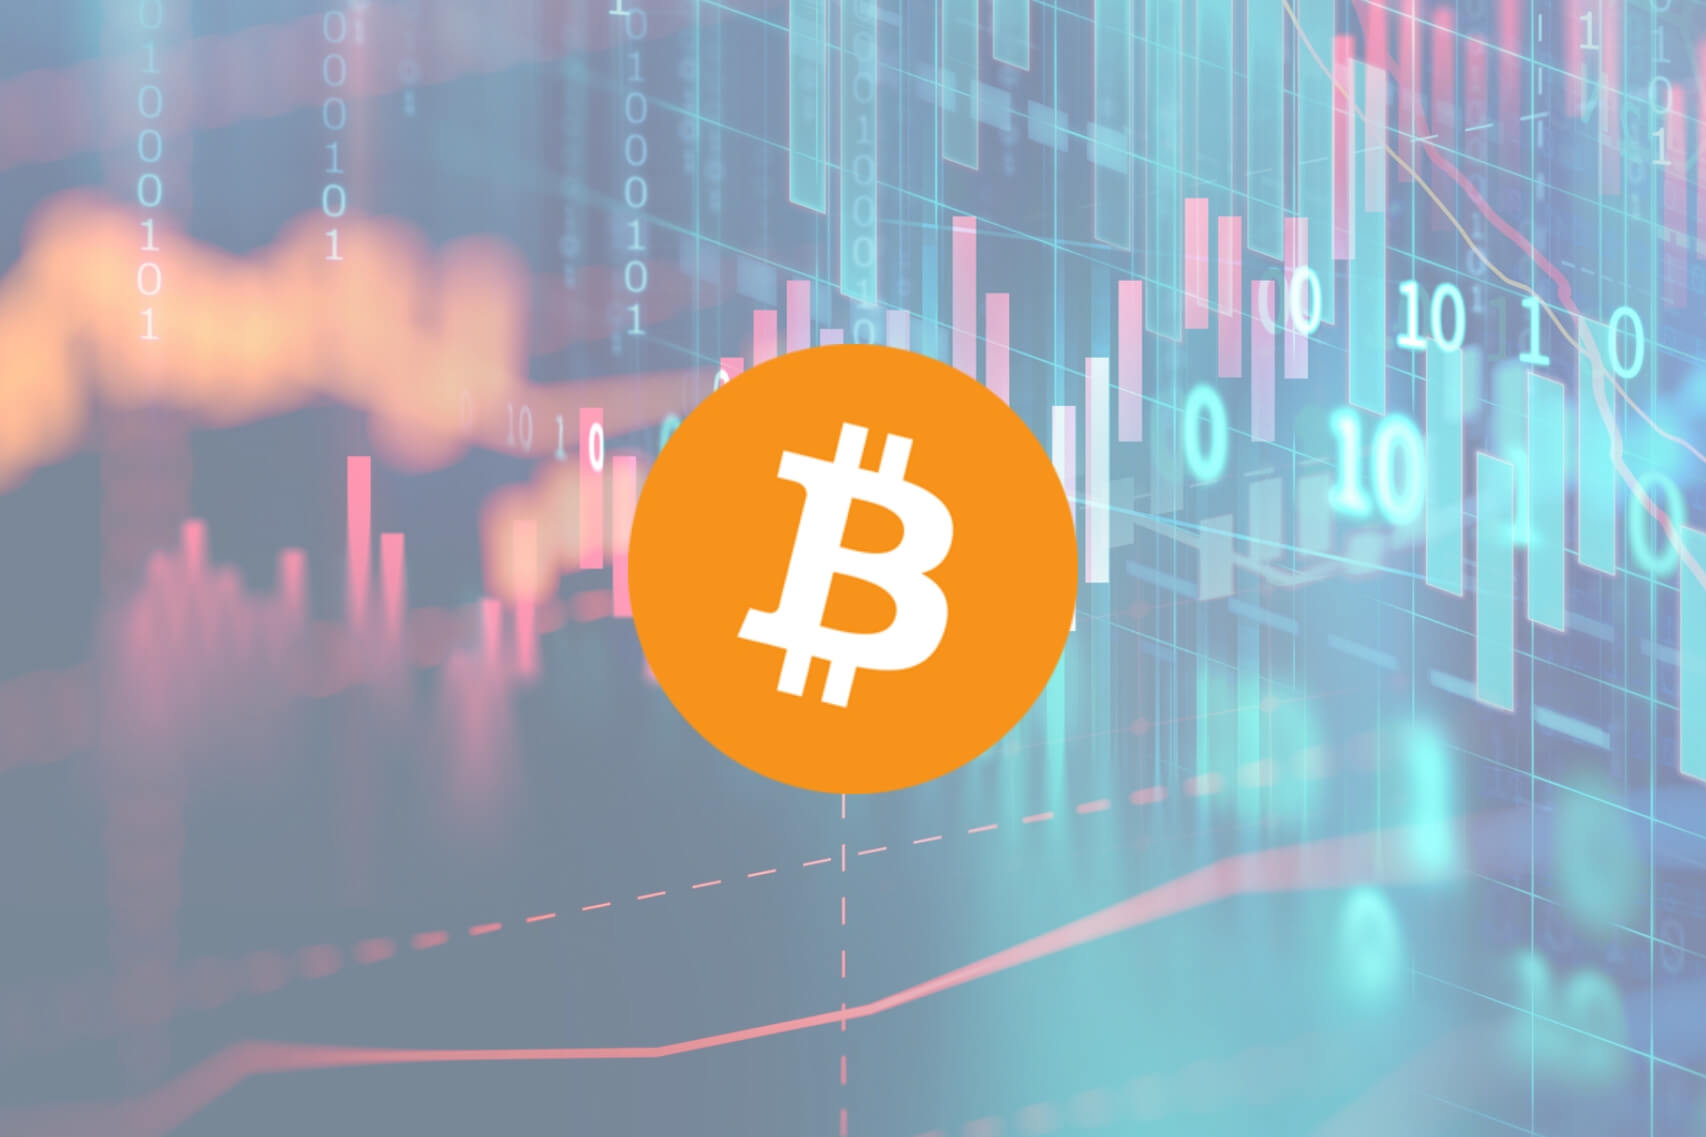 Bitcoin Fiyat Artışı Öncesi 14.000 BTC Taşındı